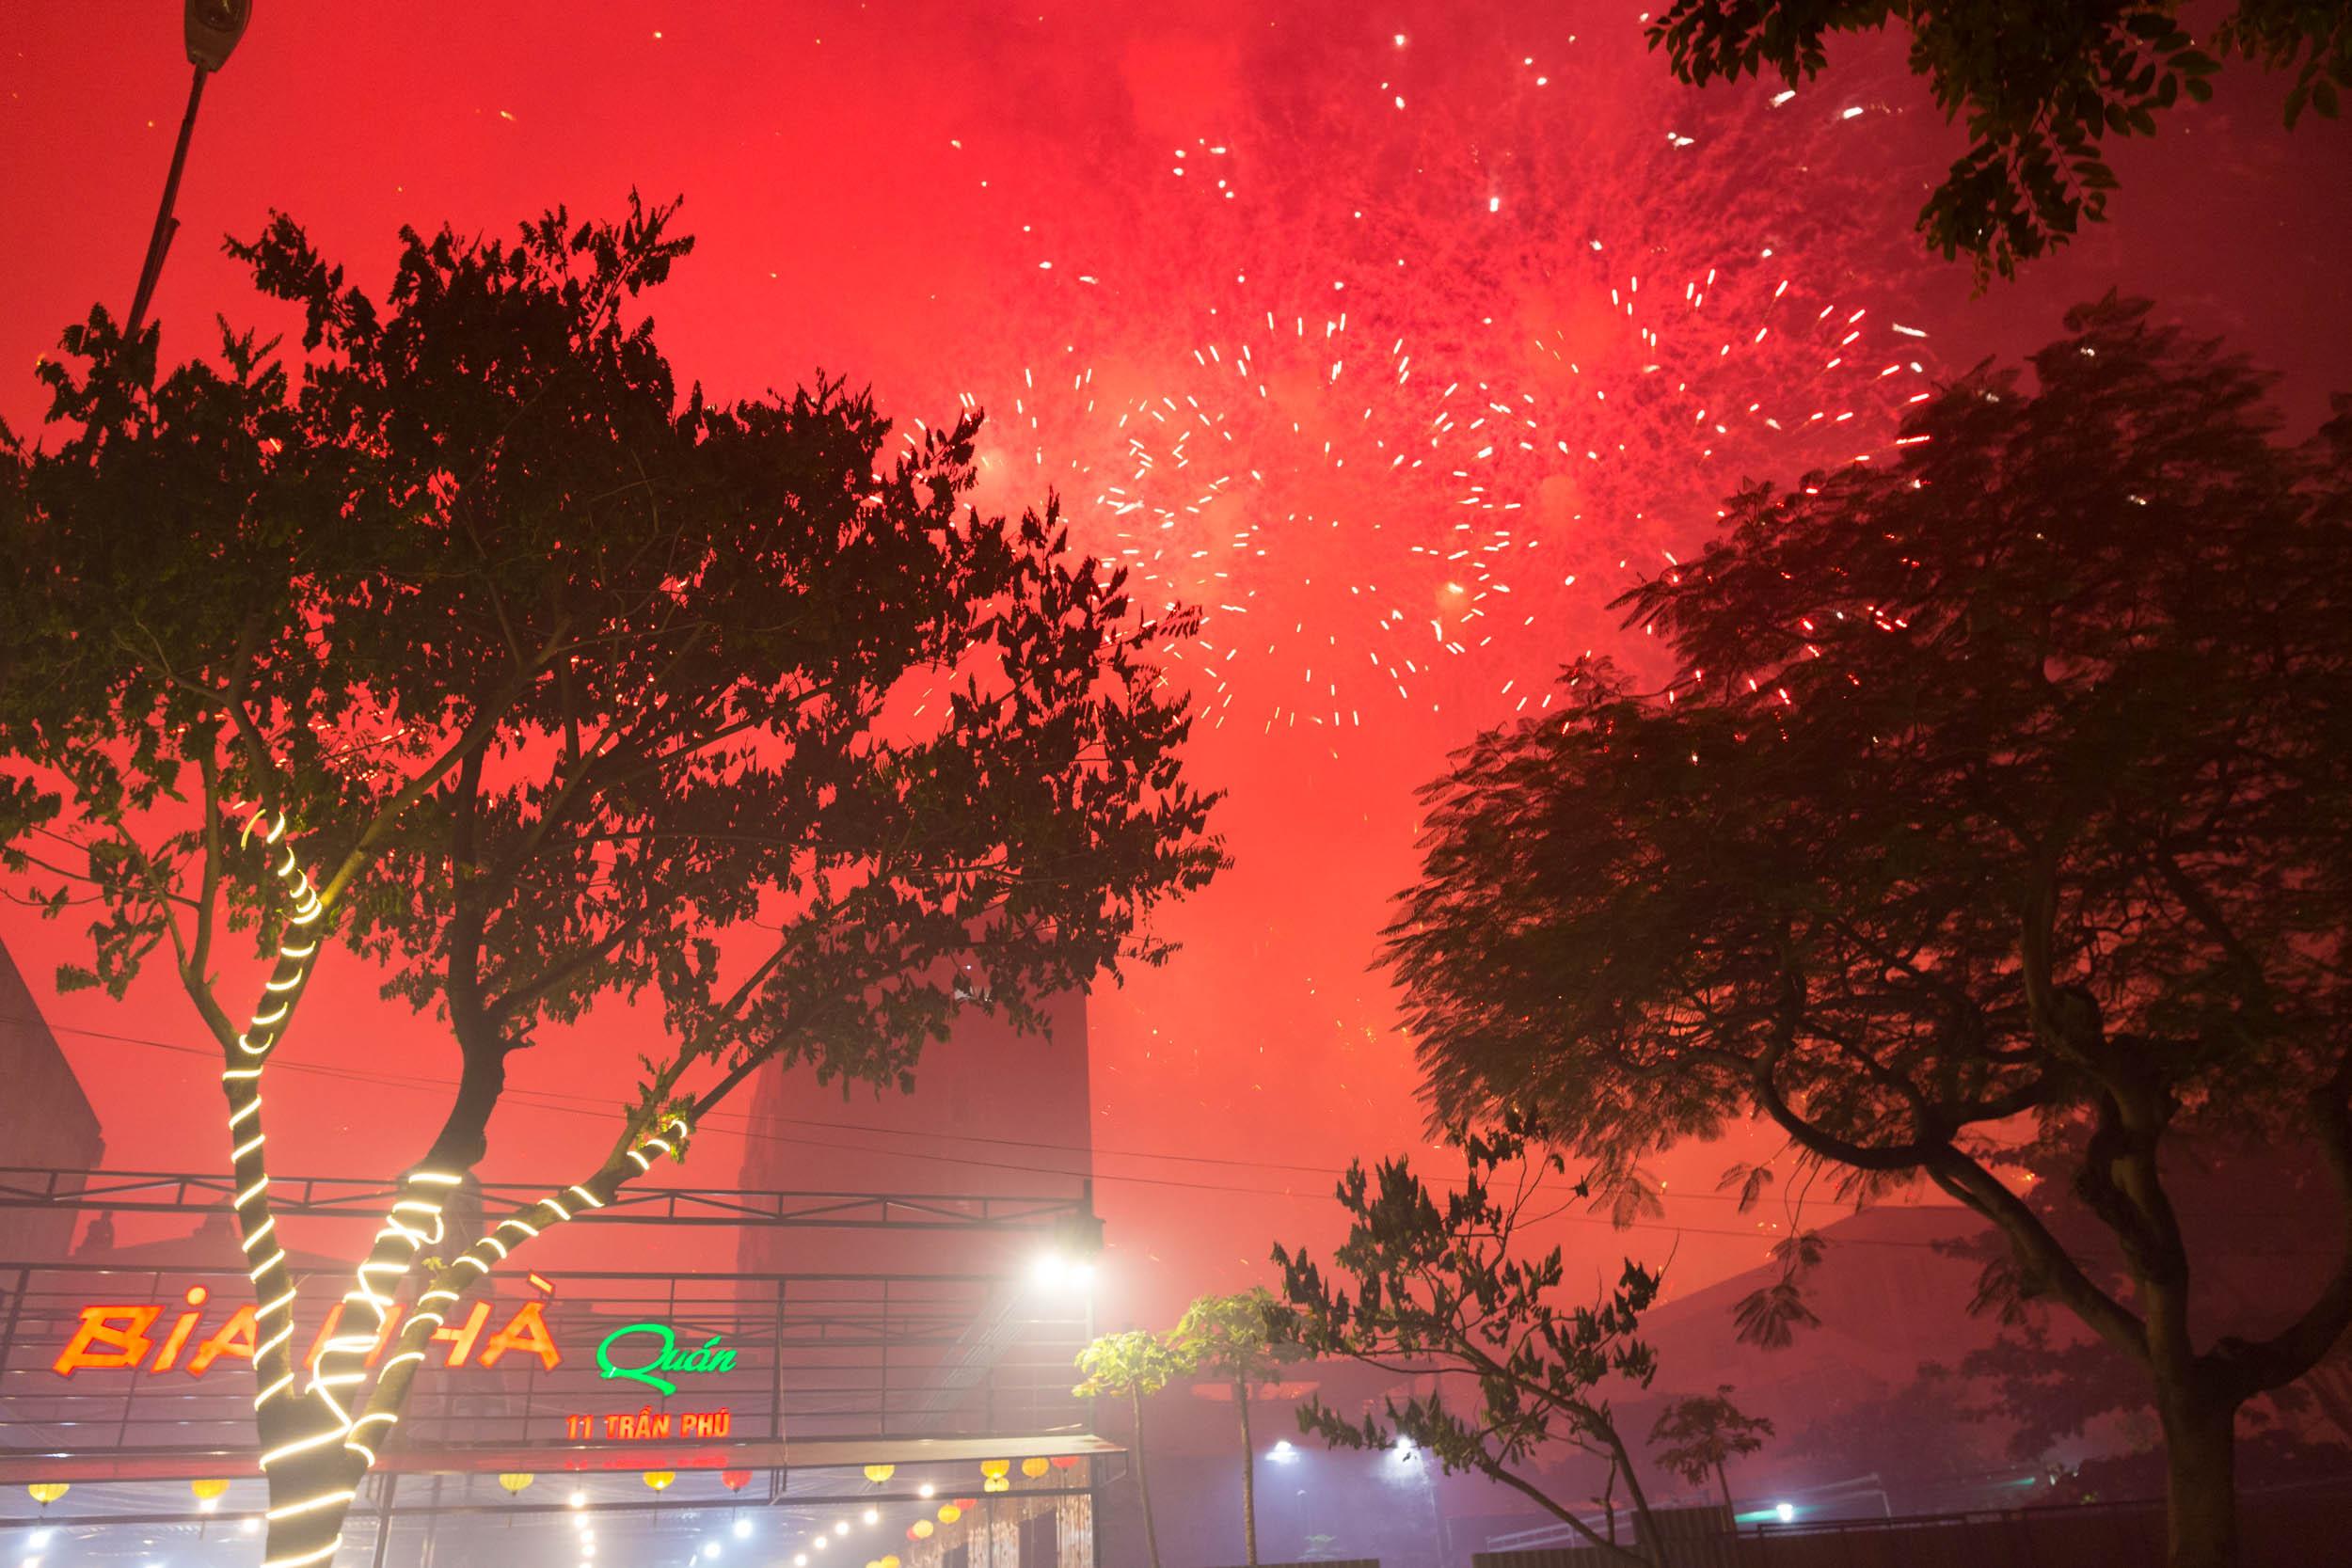 Fireworks going off in Da Nang Vietnam.